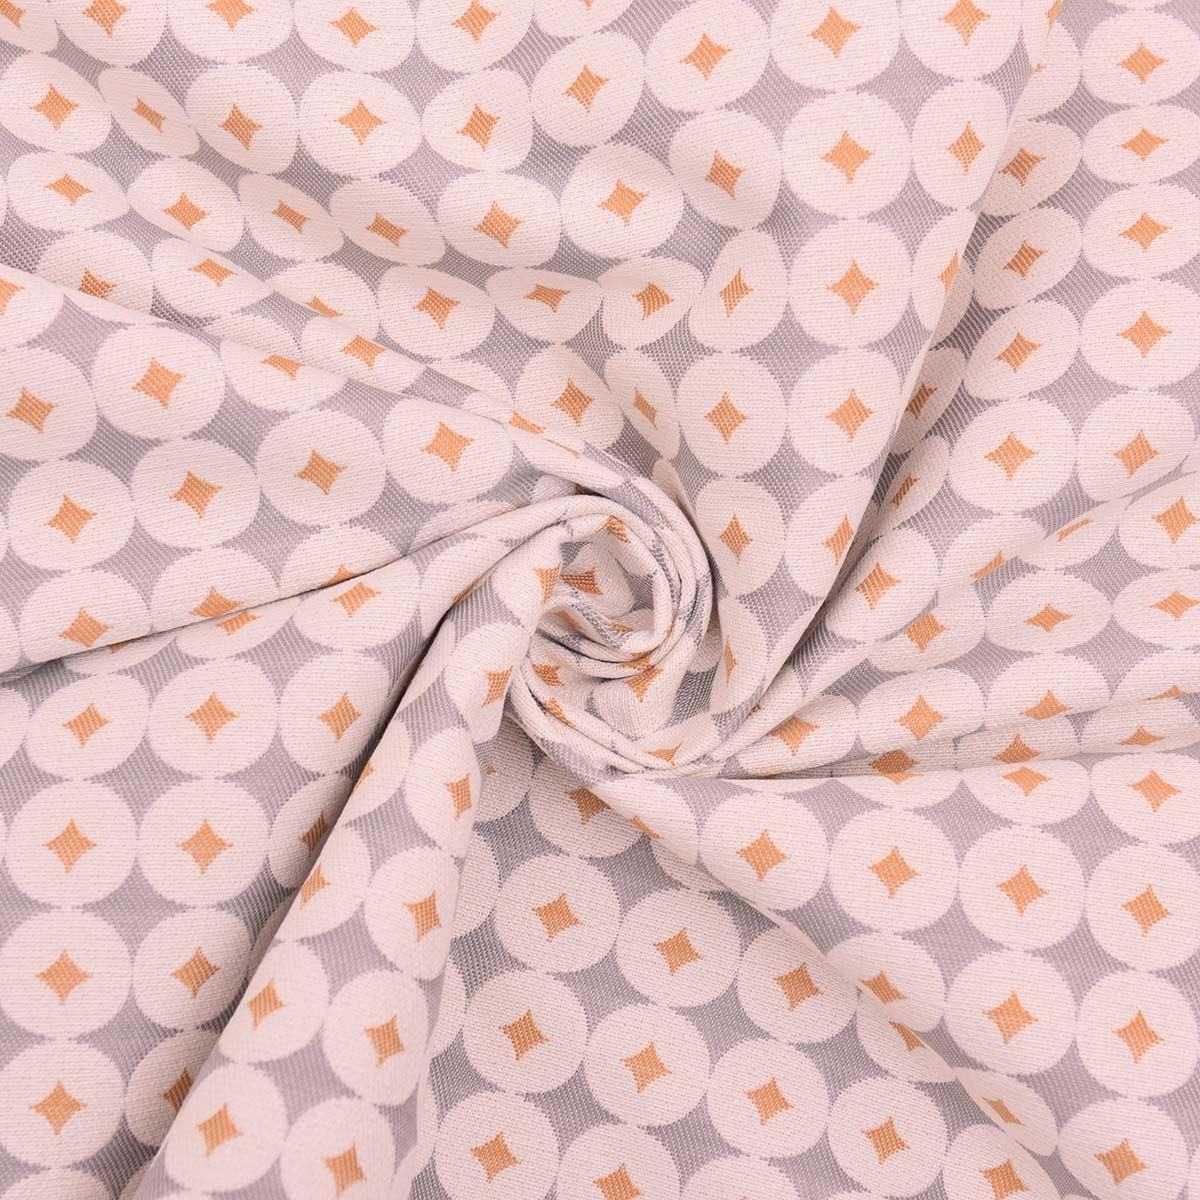 Retro Diamond Circle Luxury Thick Sofa Seating Curtain Upholstery Fabric